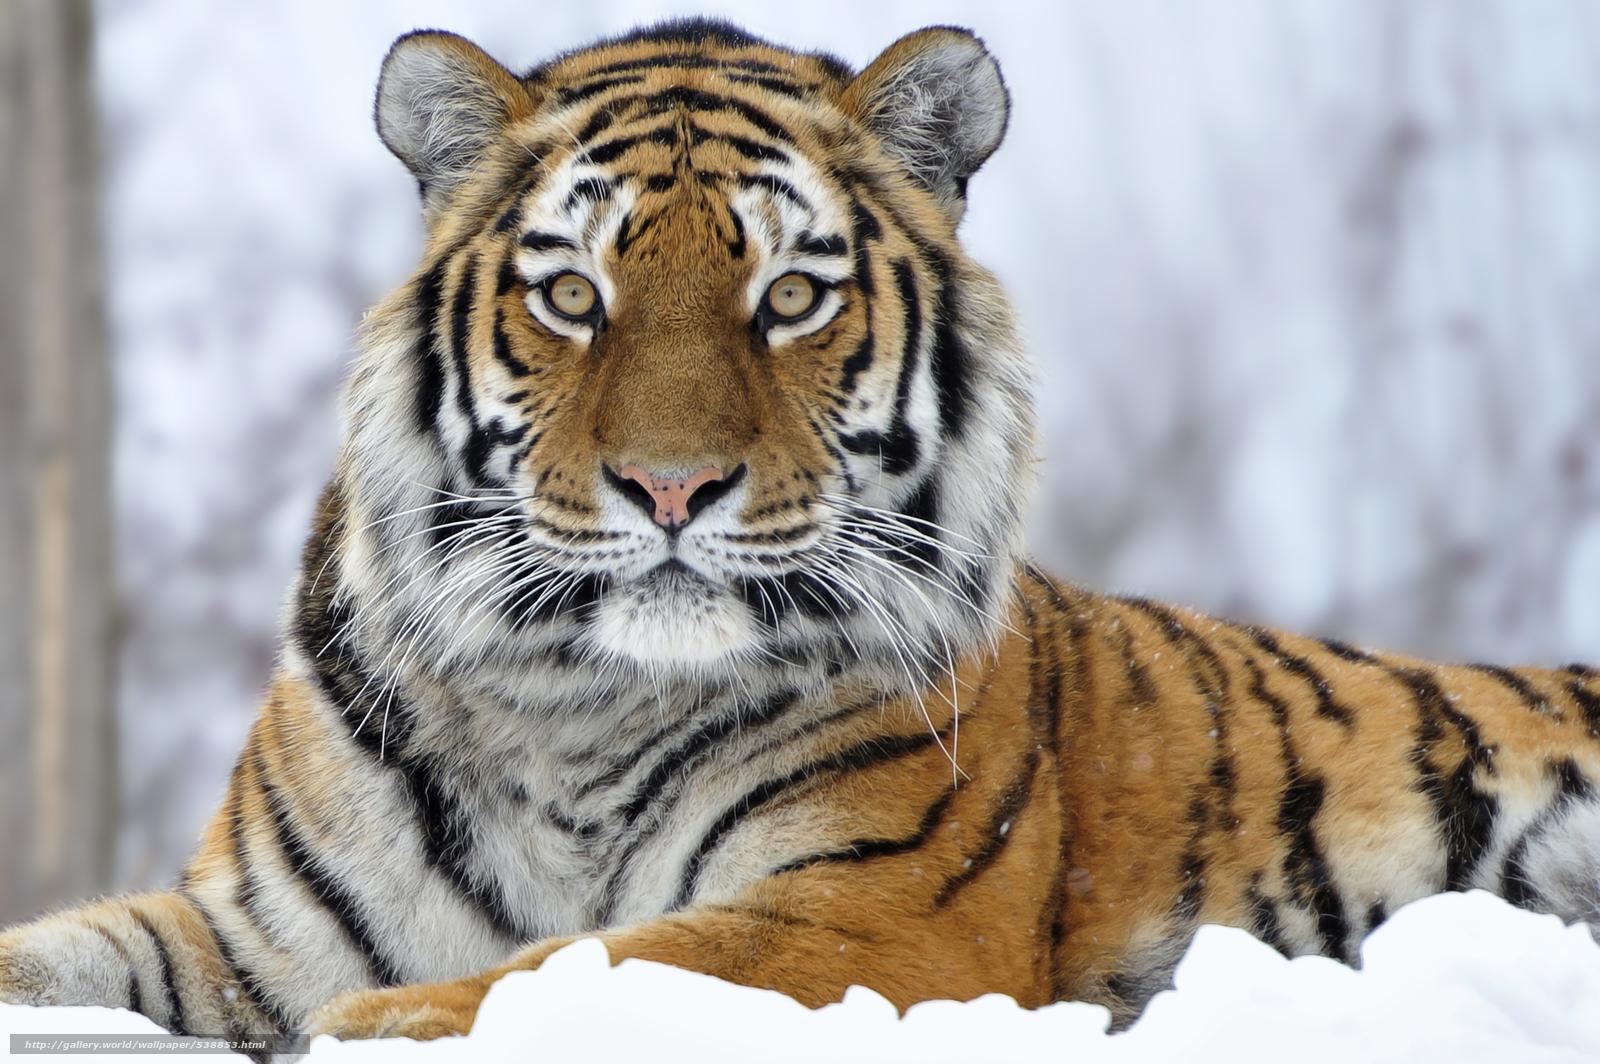 download wallpaper tiger, sitting, snow free desktop wallpaper in